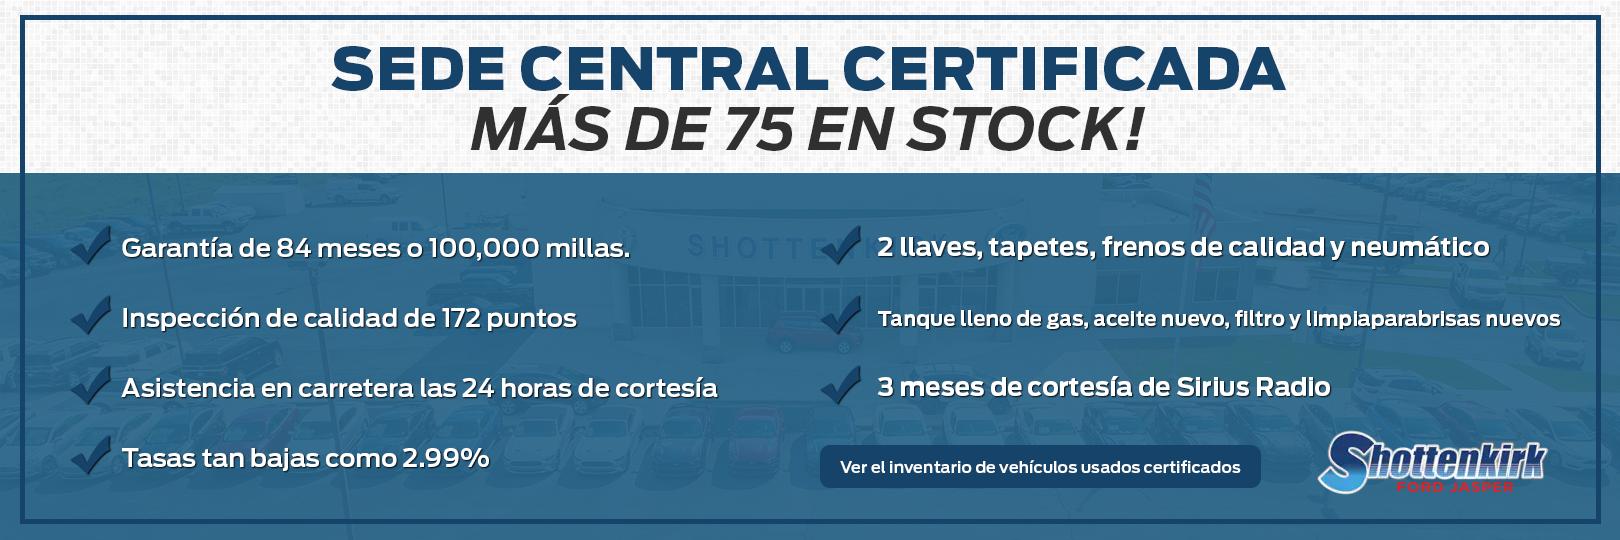 cpo benefits in spanish